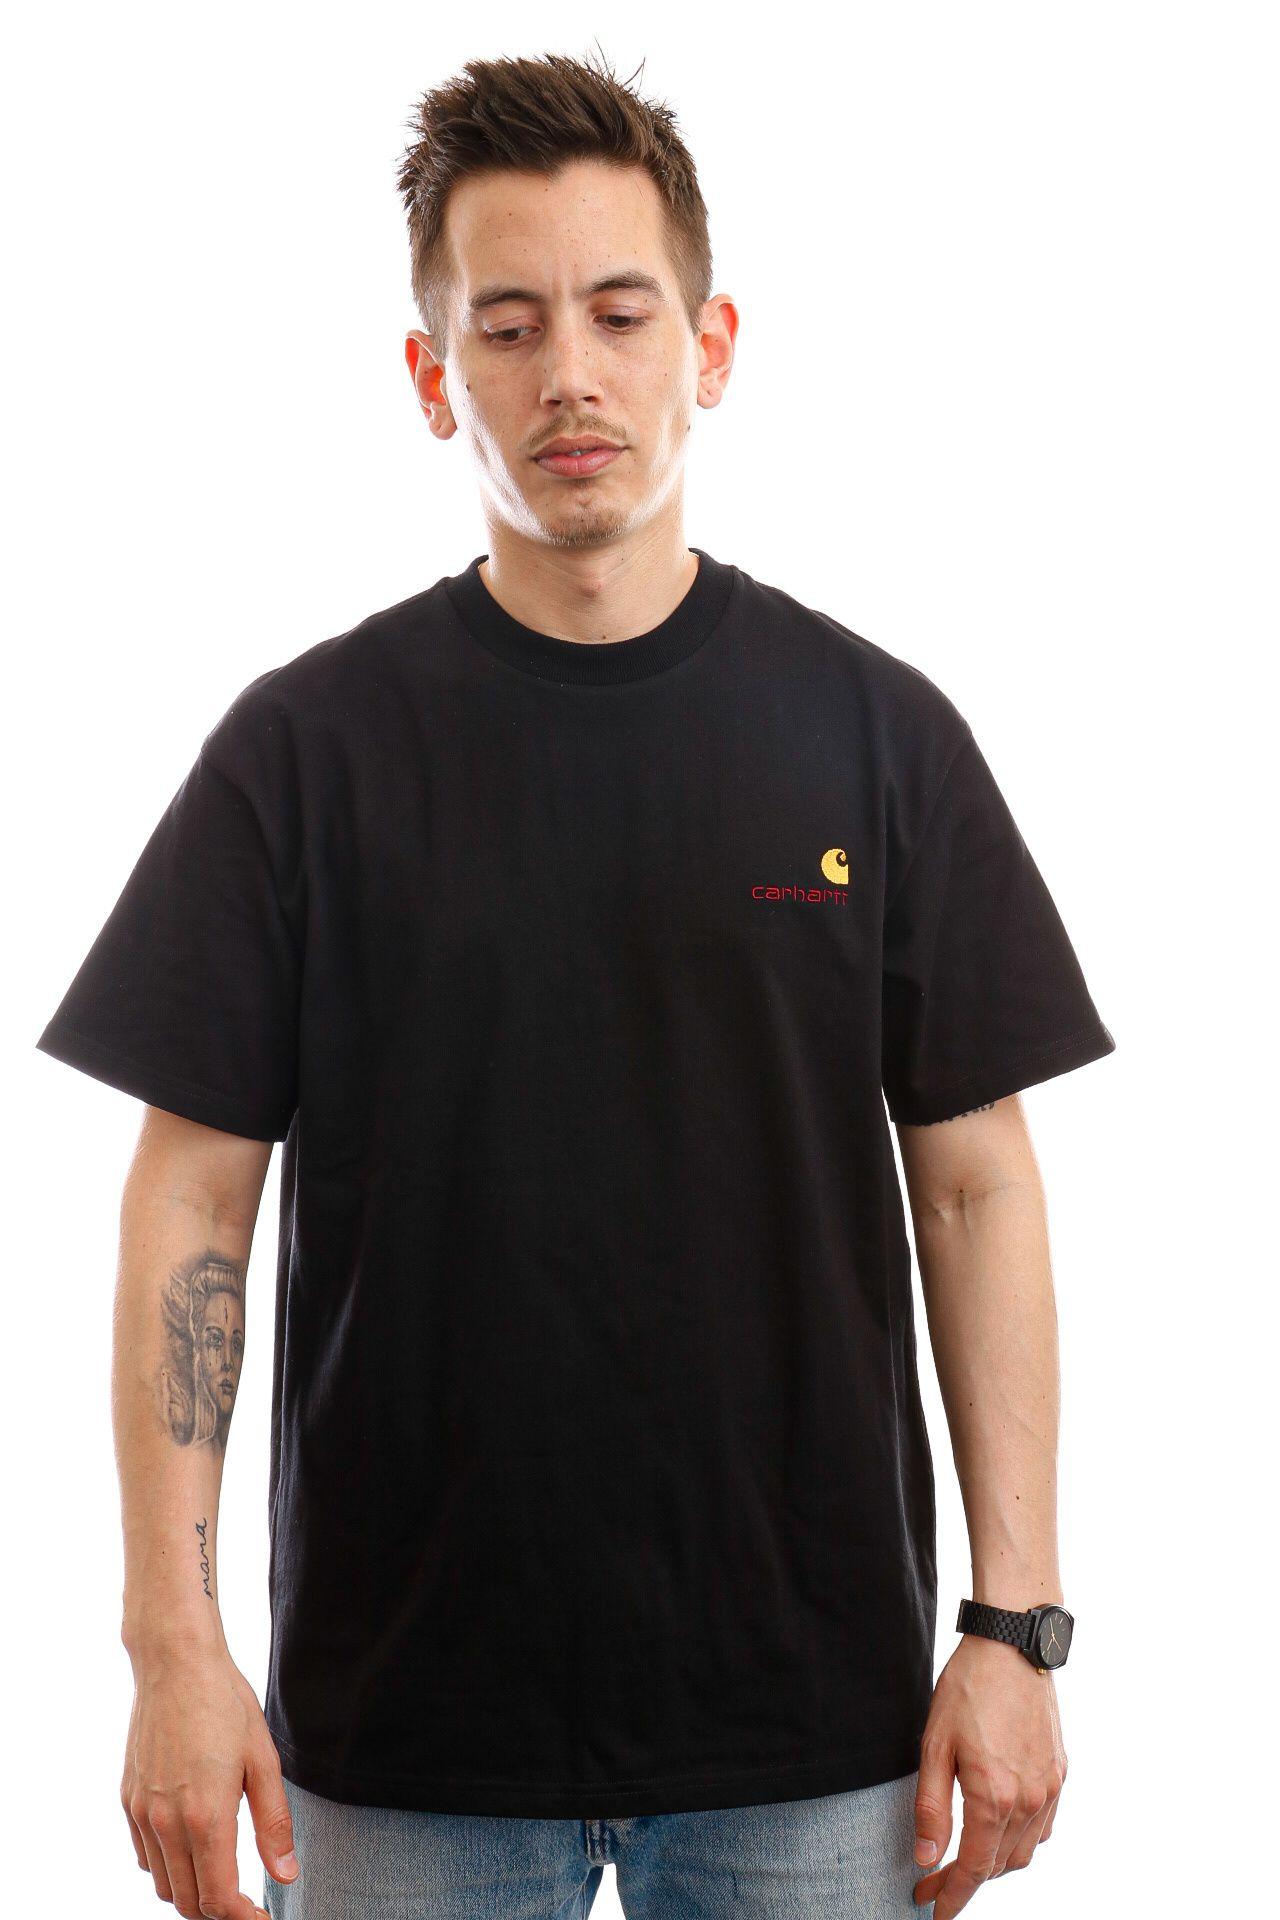 Afbeelding van Carhartt T-shirt S/S American Script T-Shirt Black I029007